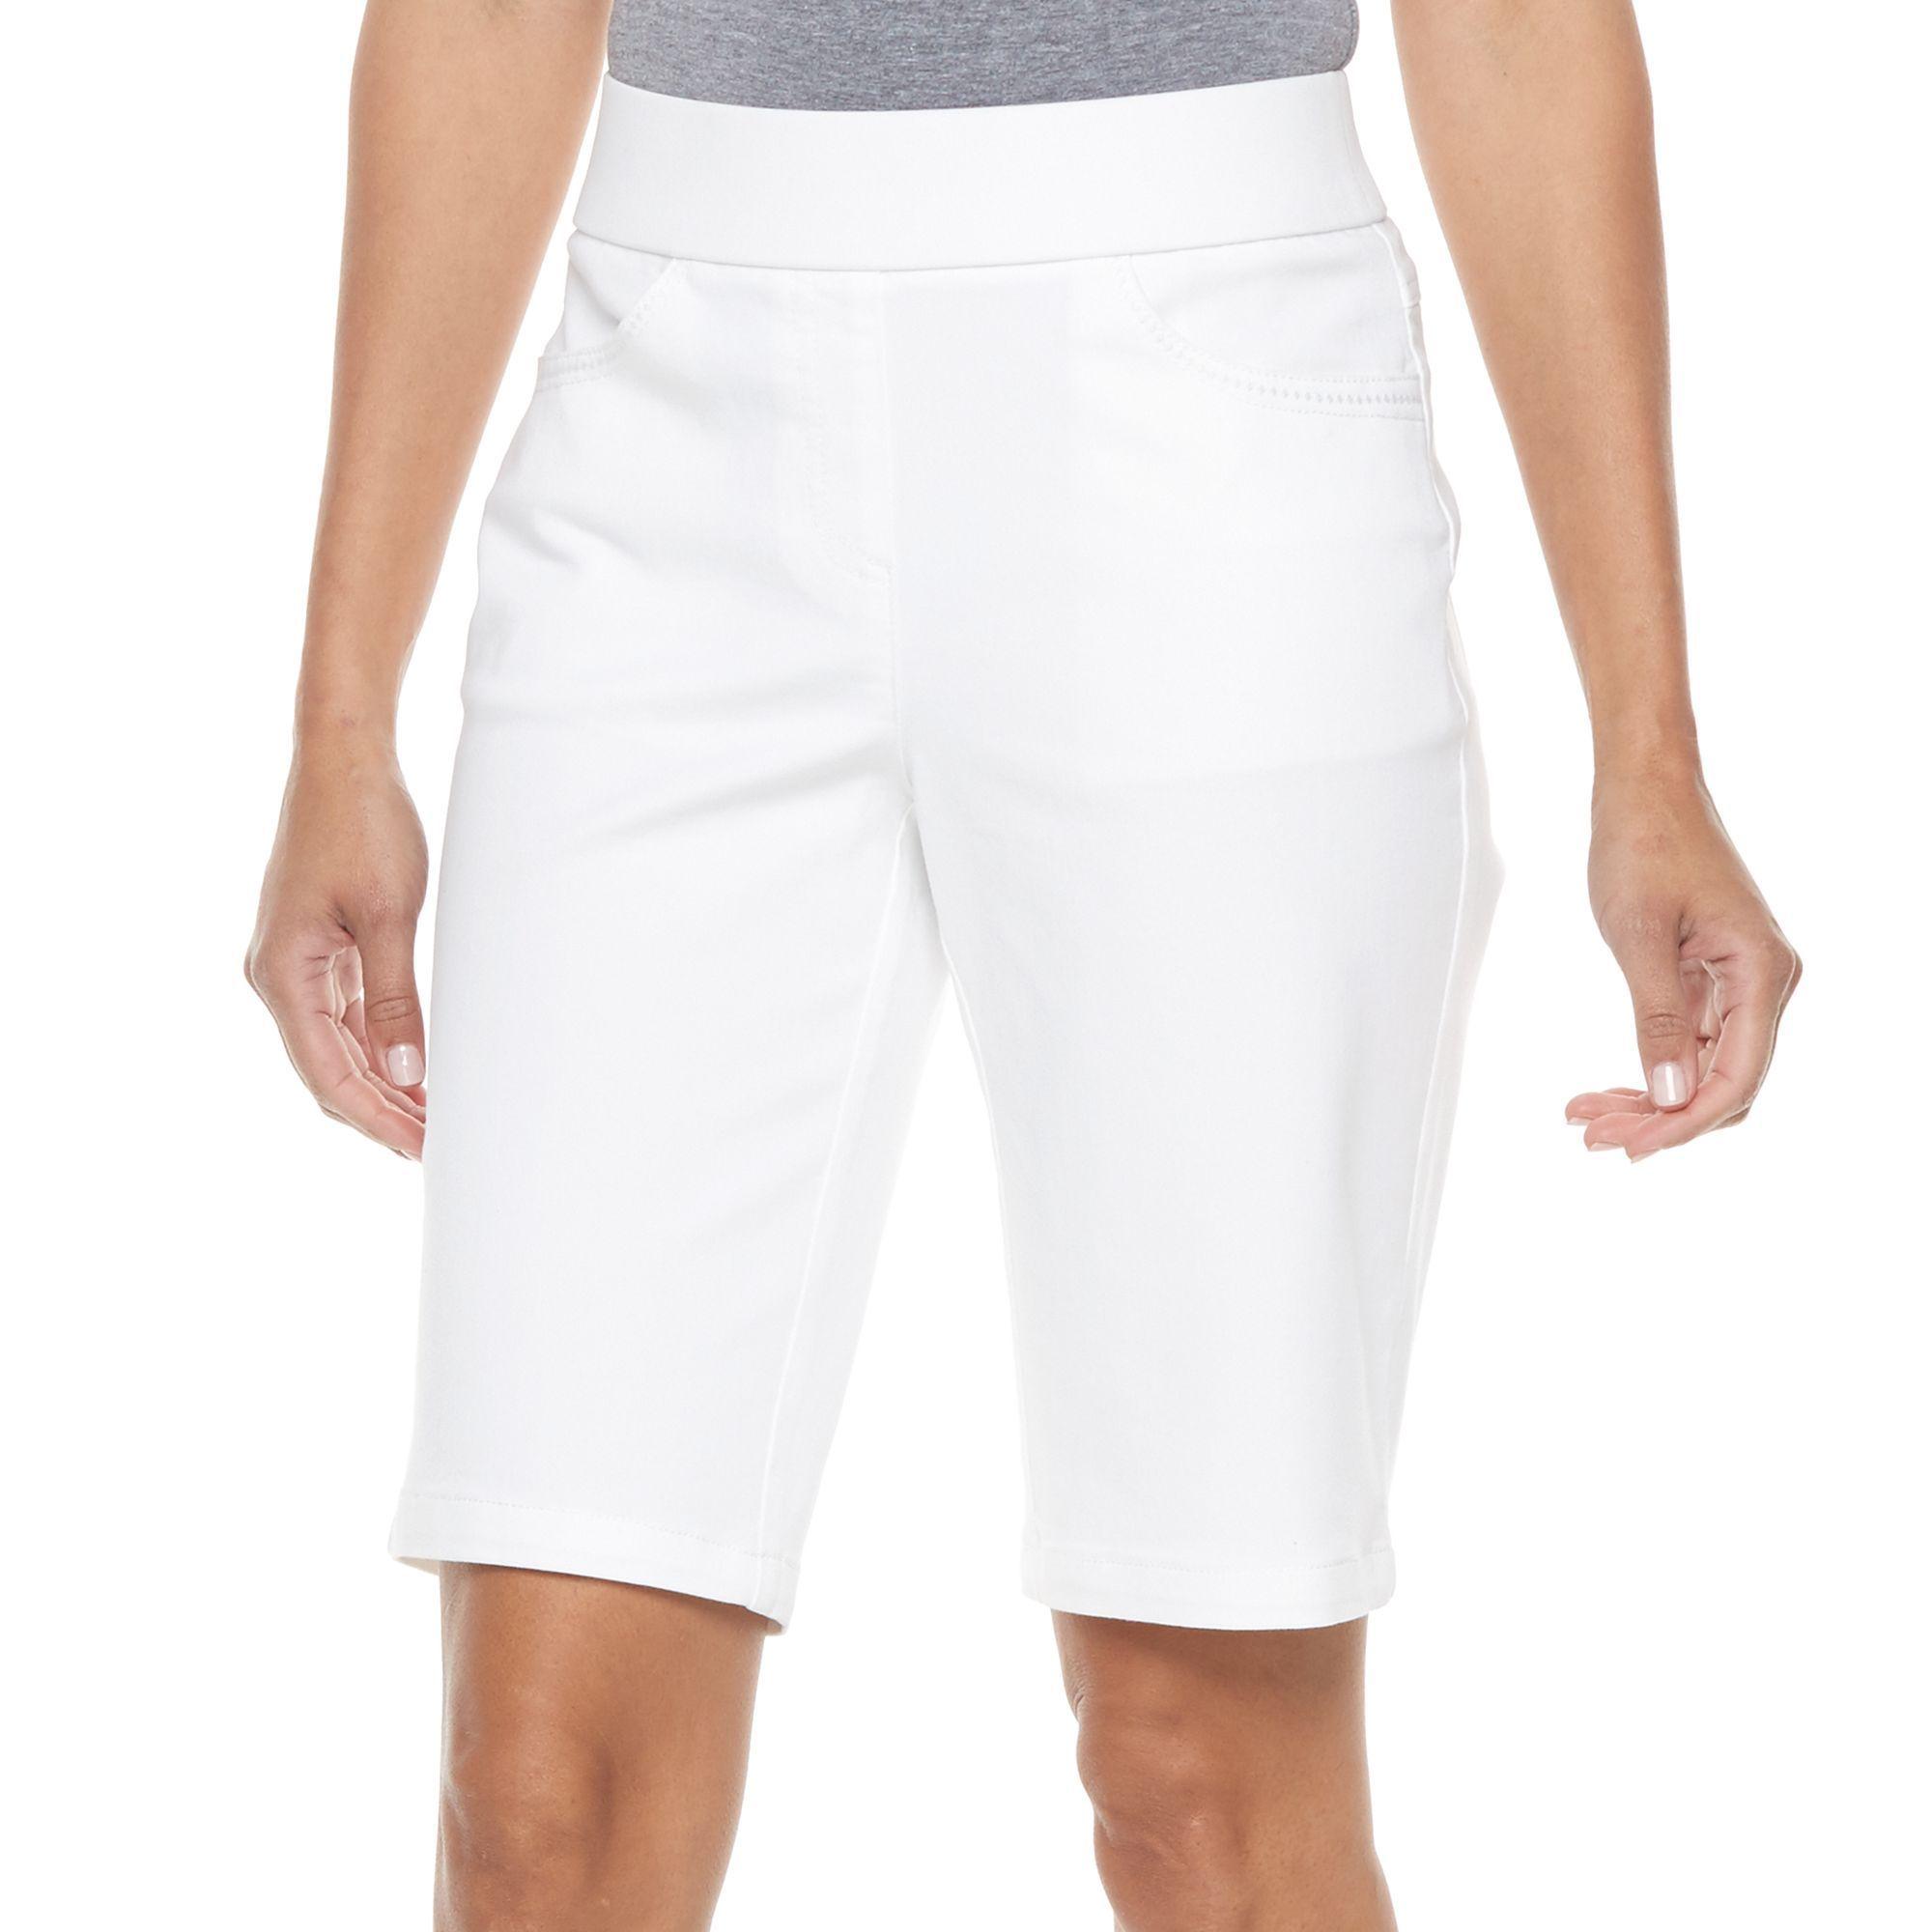 Petite Kate and Sam Stretch Bermuda Shorts, Women's, Size: Xl ...